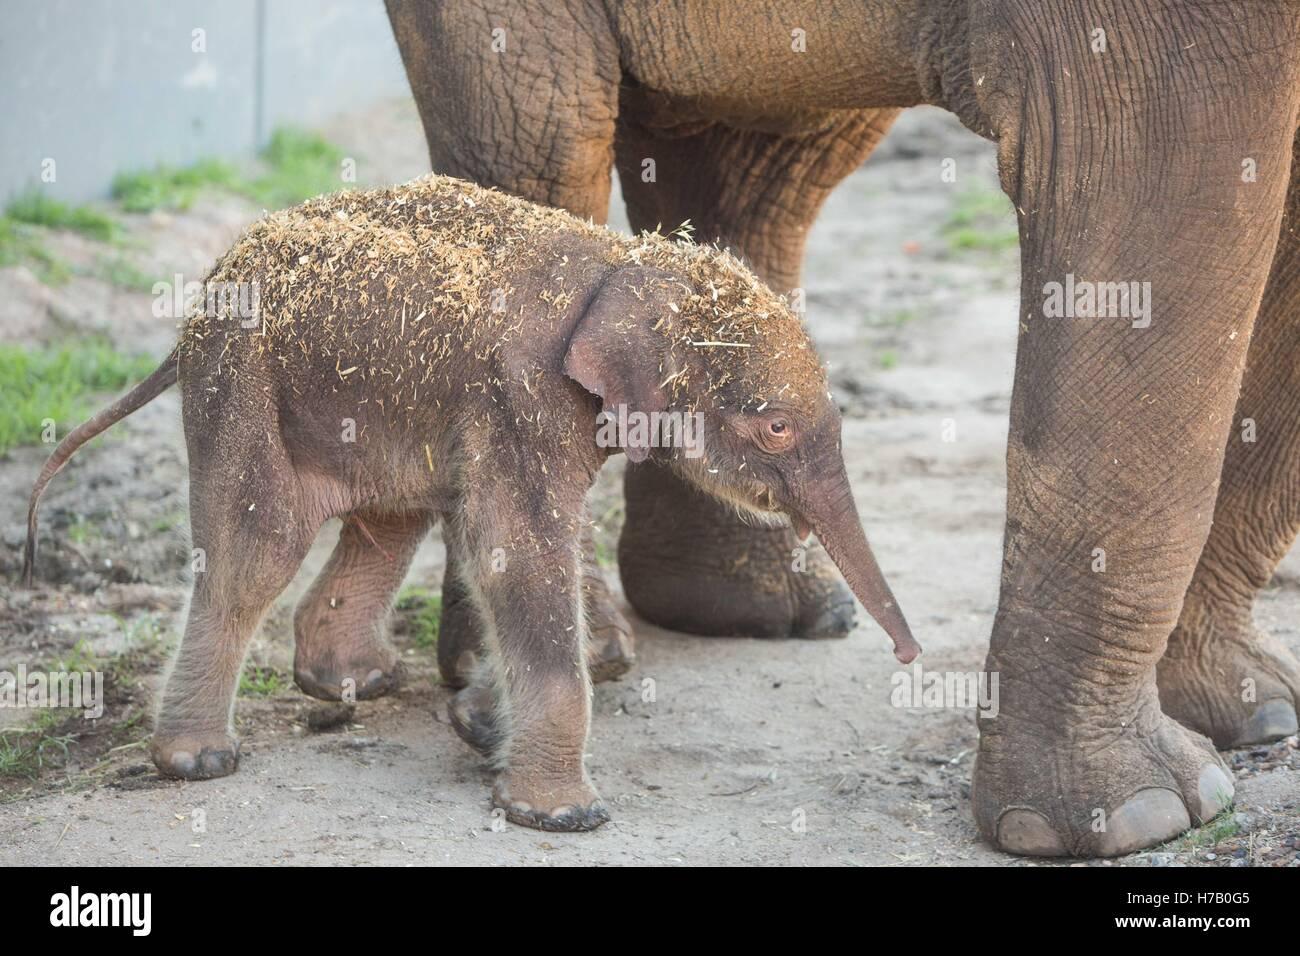 New South Wales, Australia.. 3rd Nov, 2016. Photo taken on Nov. 3, 2016, shows an Asian elephant calf in Australia's Stock Photo